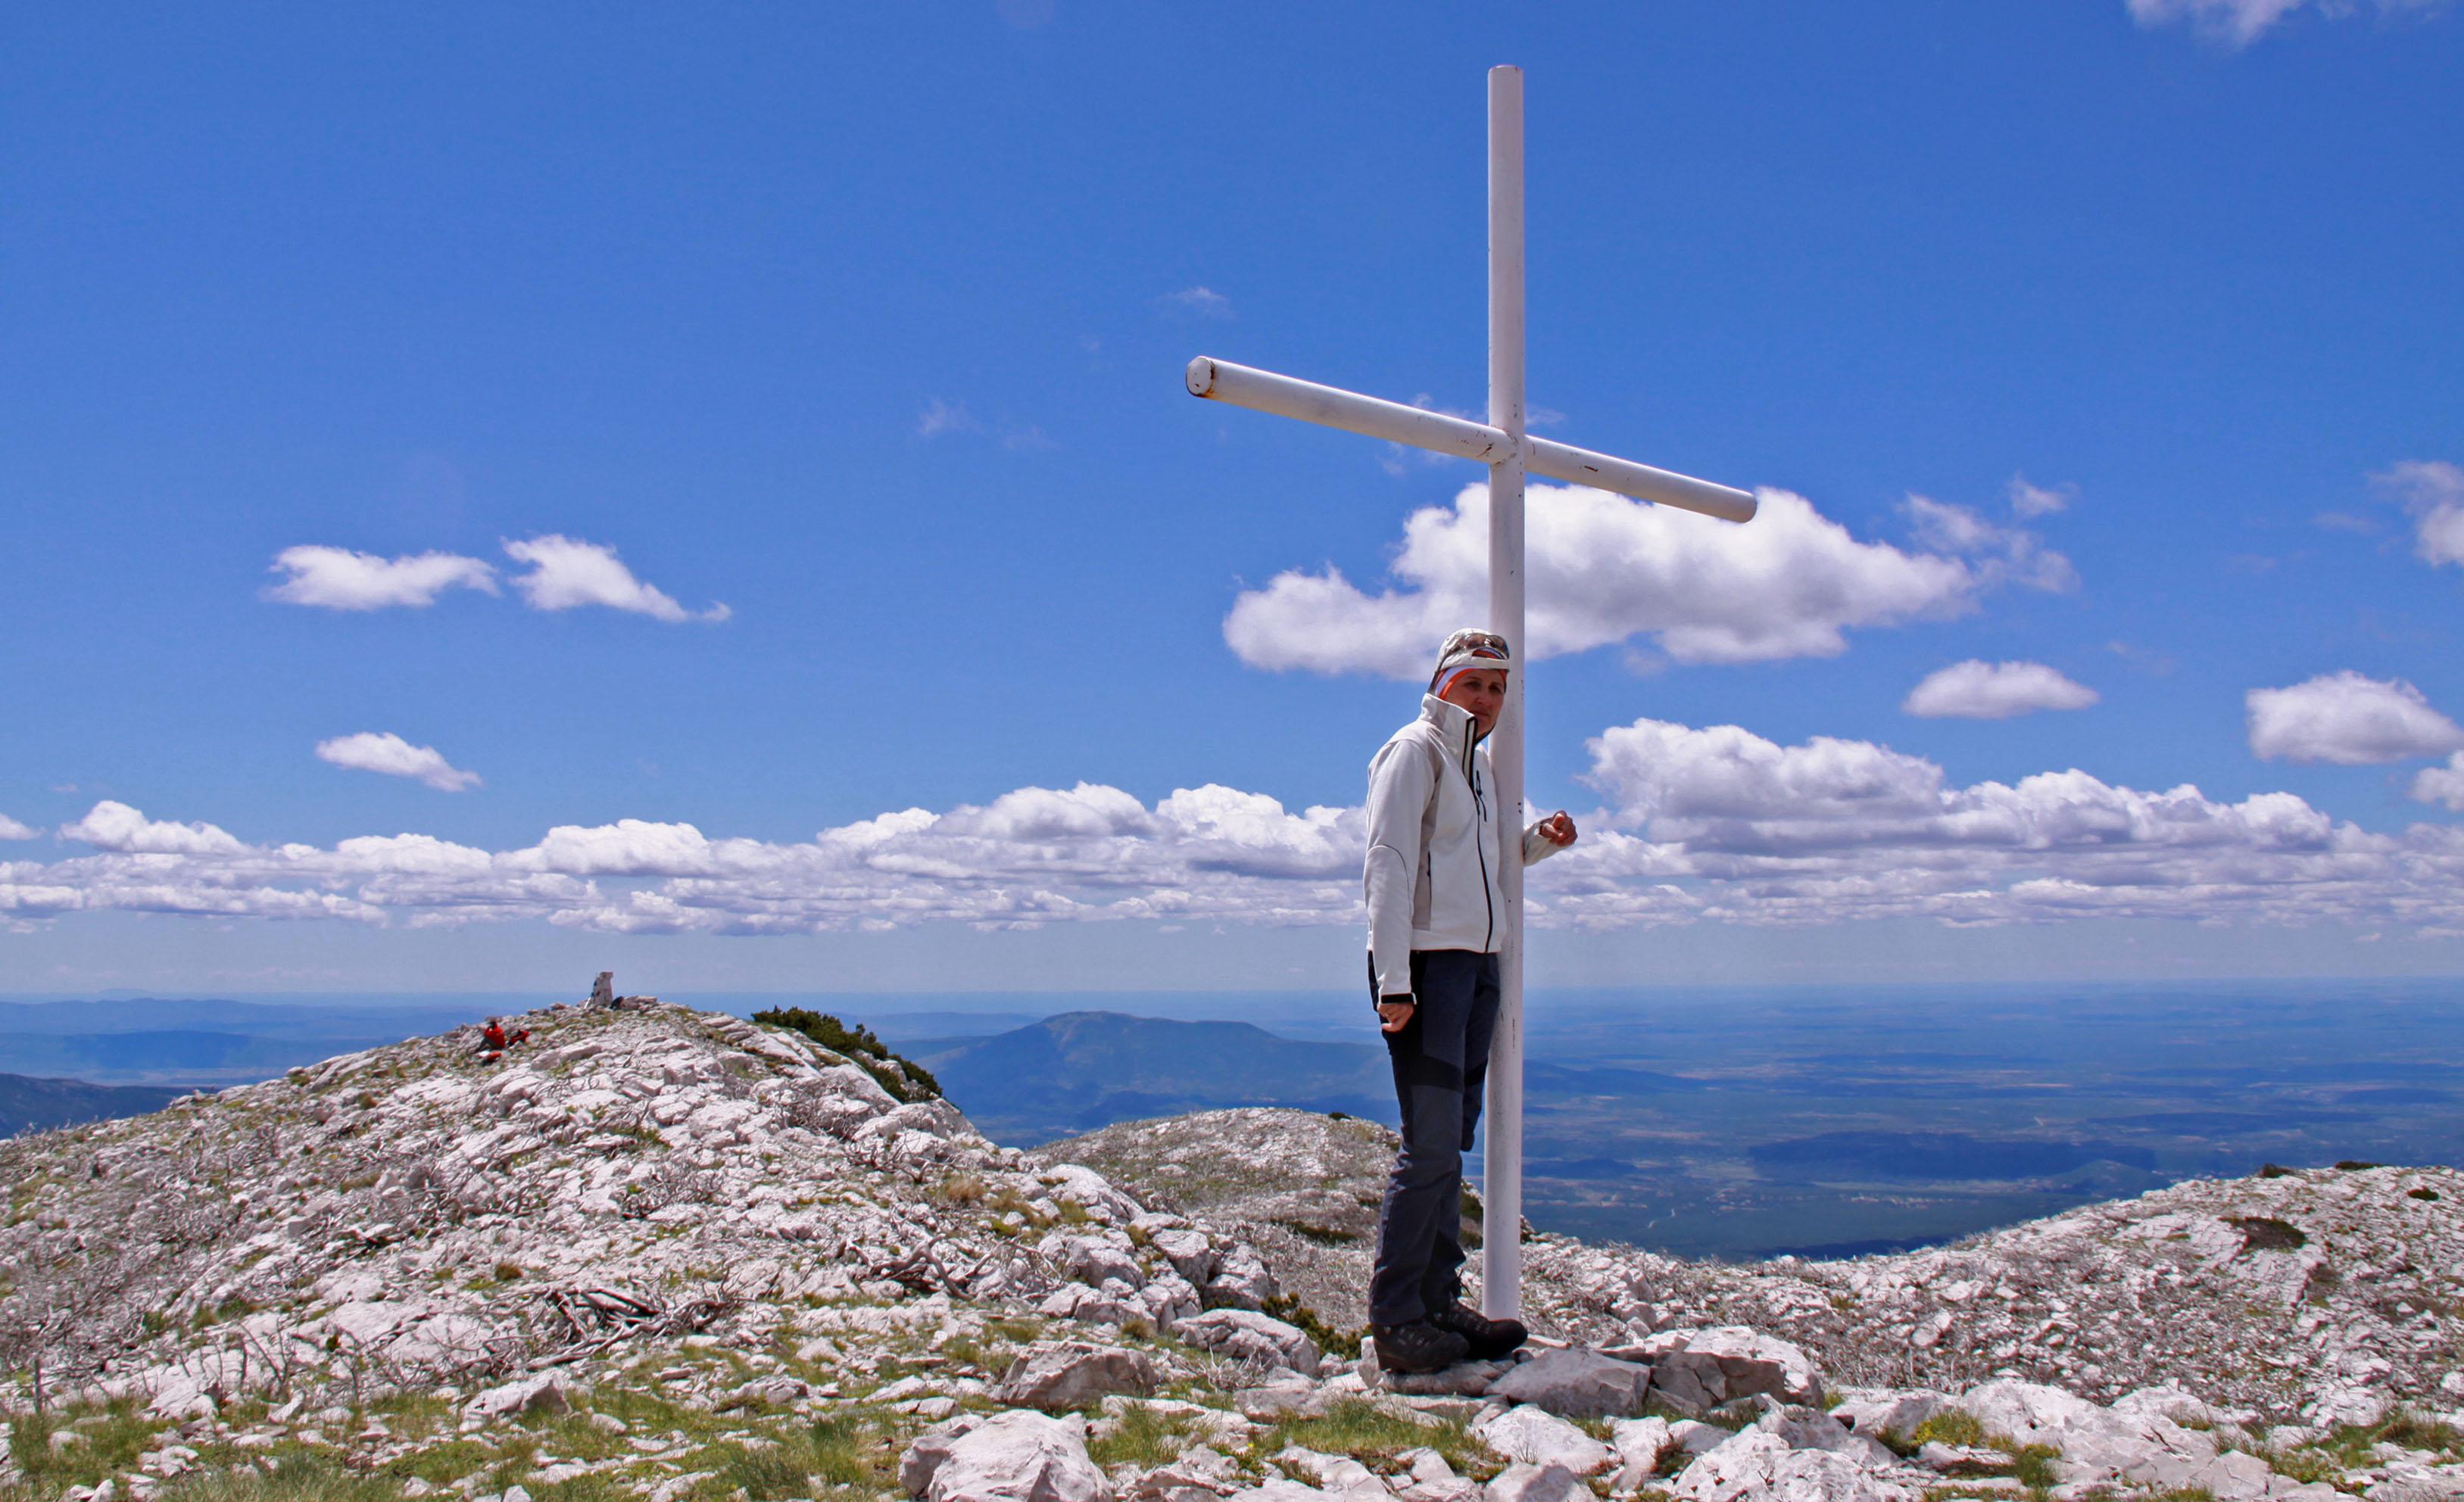 Gipfel_Dinara Marianne 2753